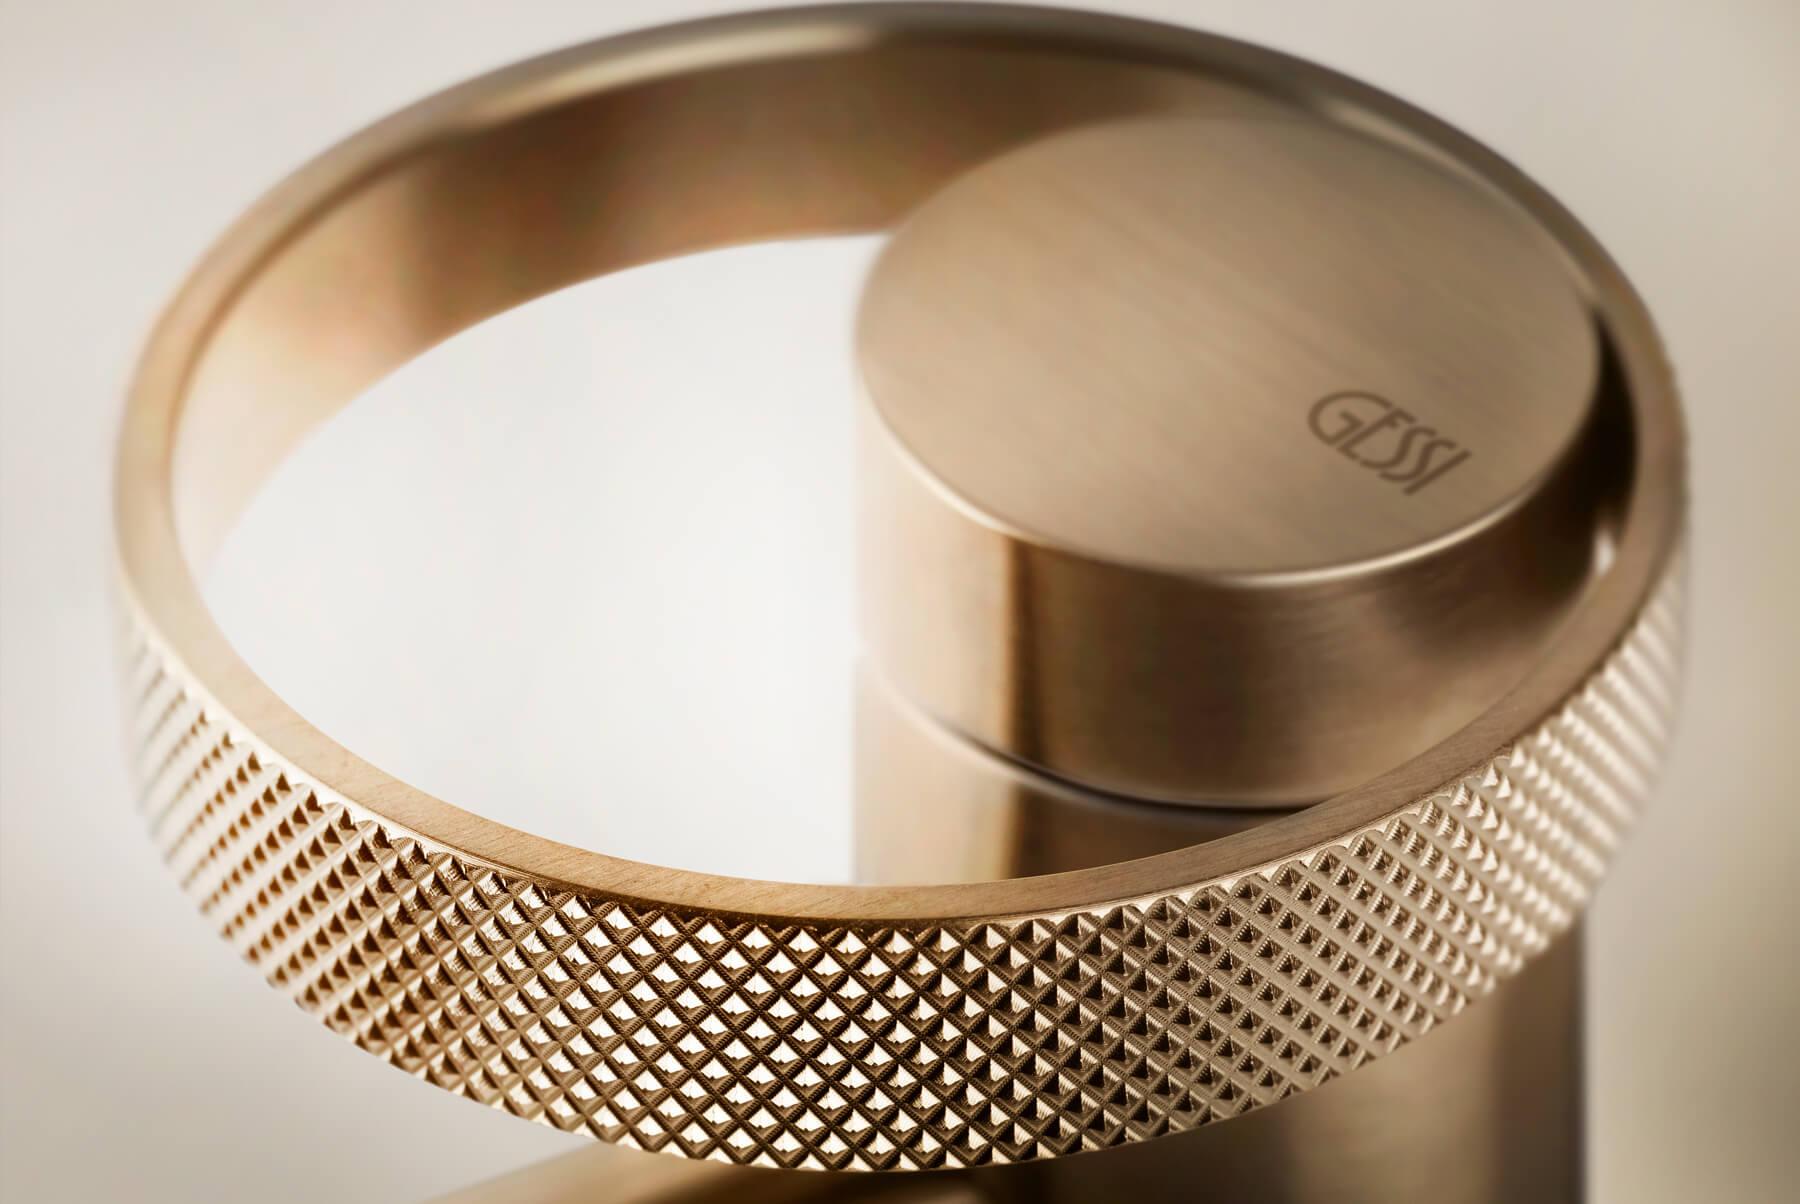 Brassware-GESSI-Anello-Inset-6-1800x1204